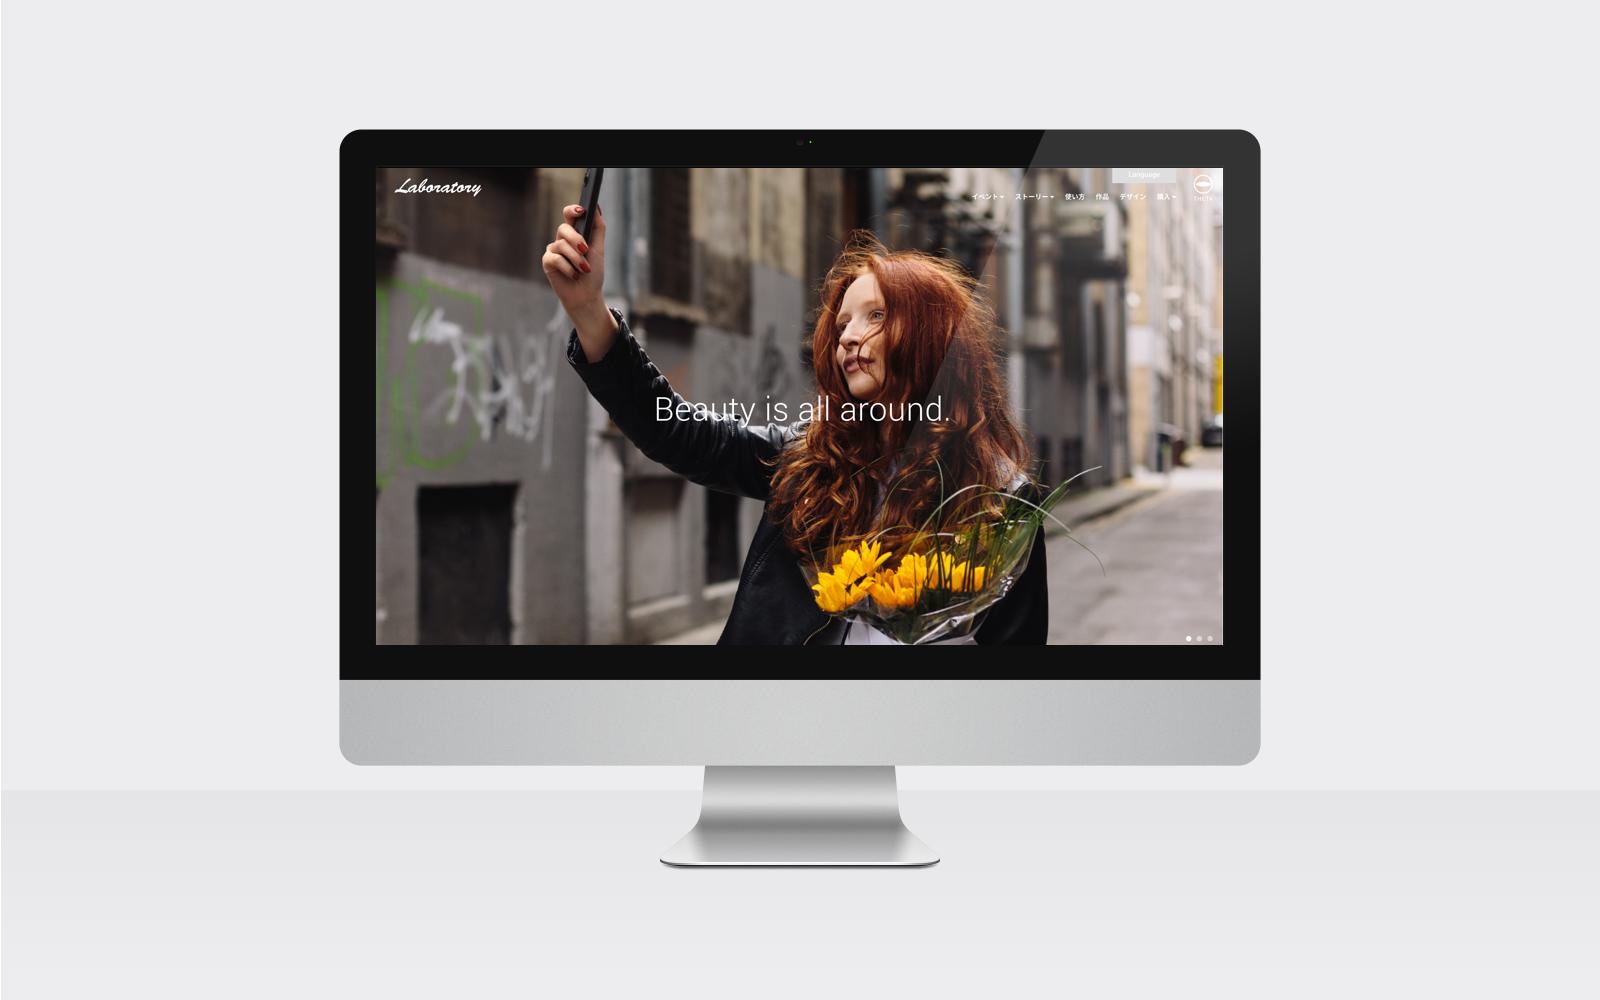 THETAファンに向けた公式ブランドサイト「RICOH THETA Lab.」